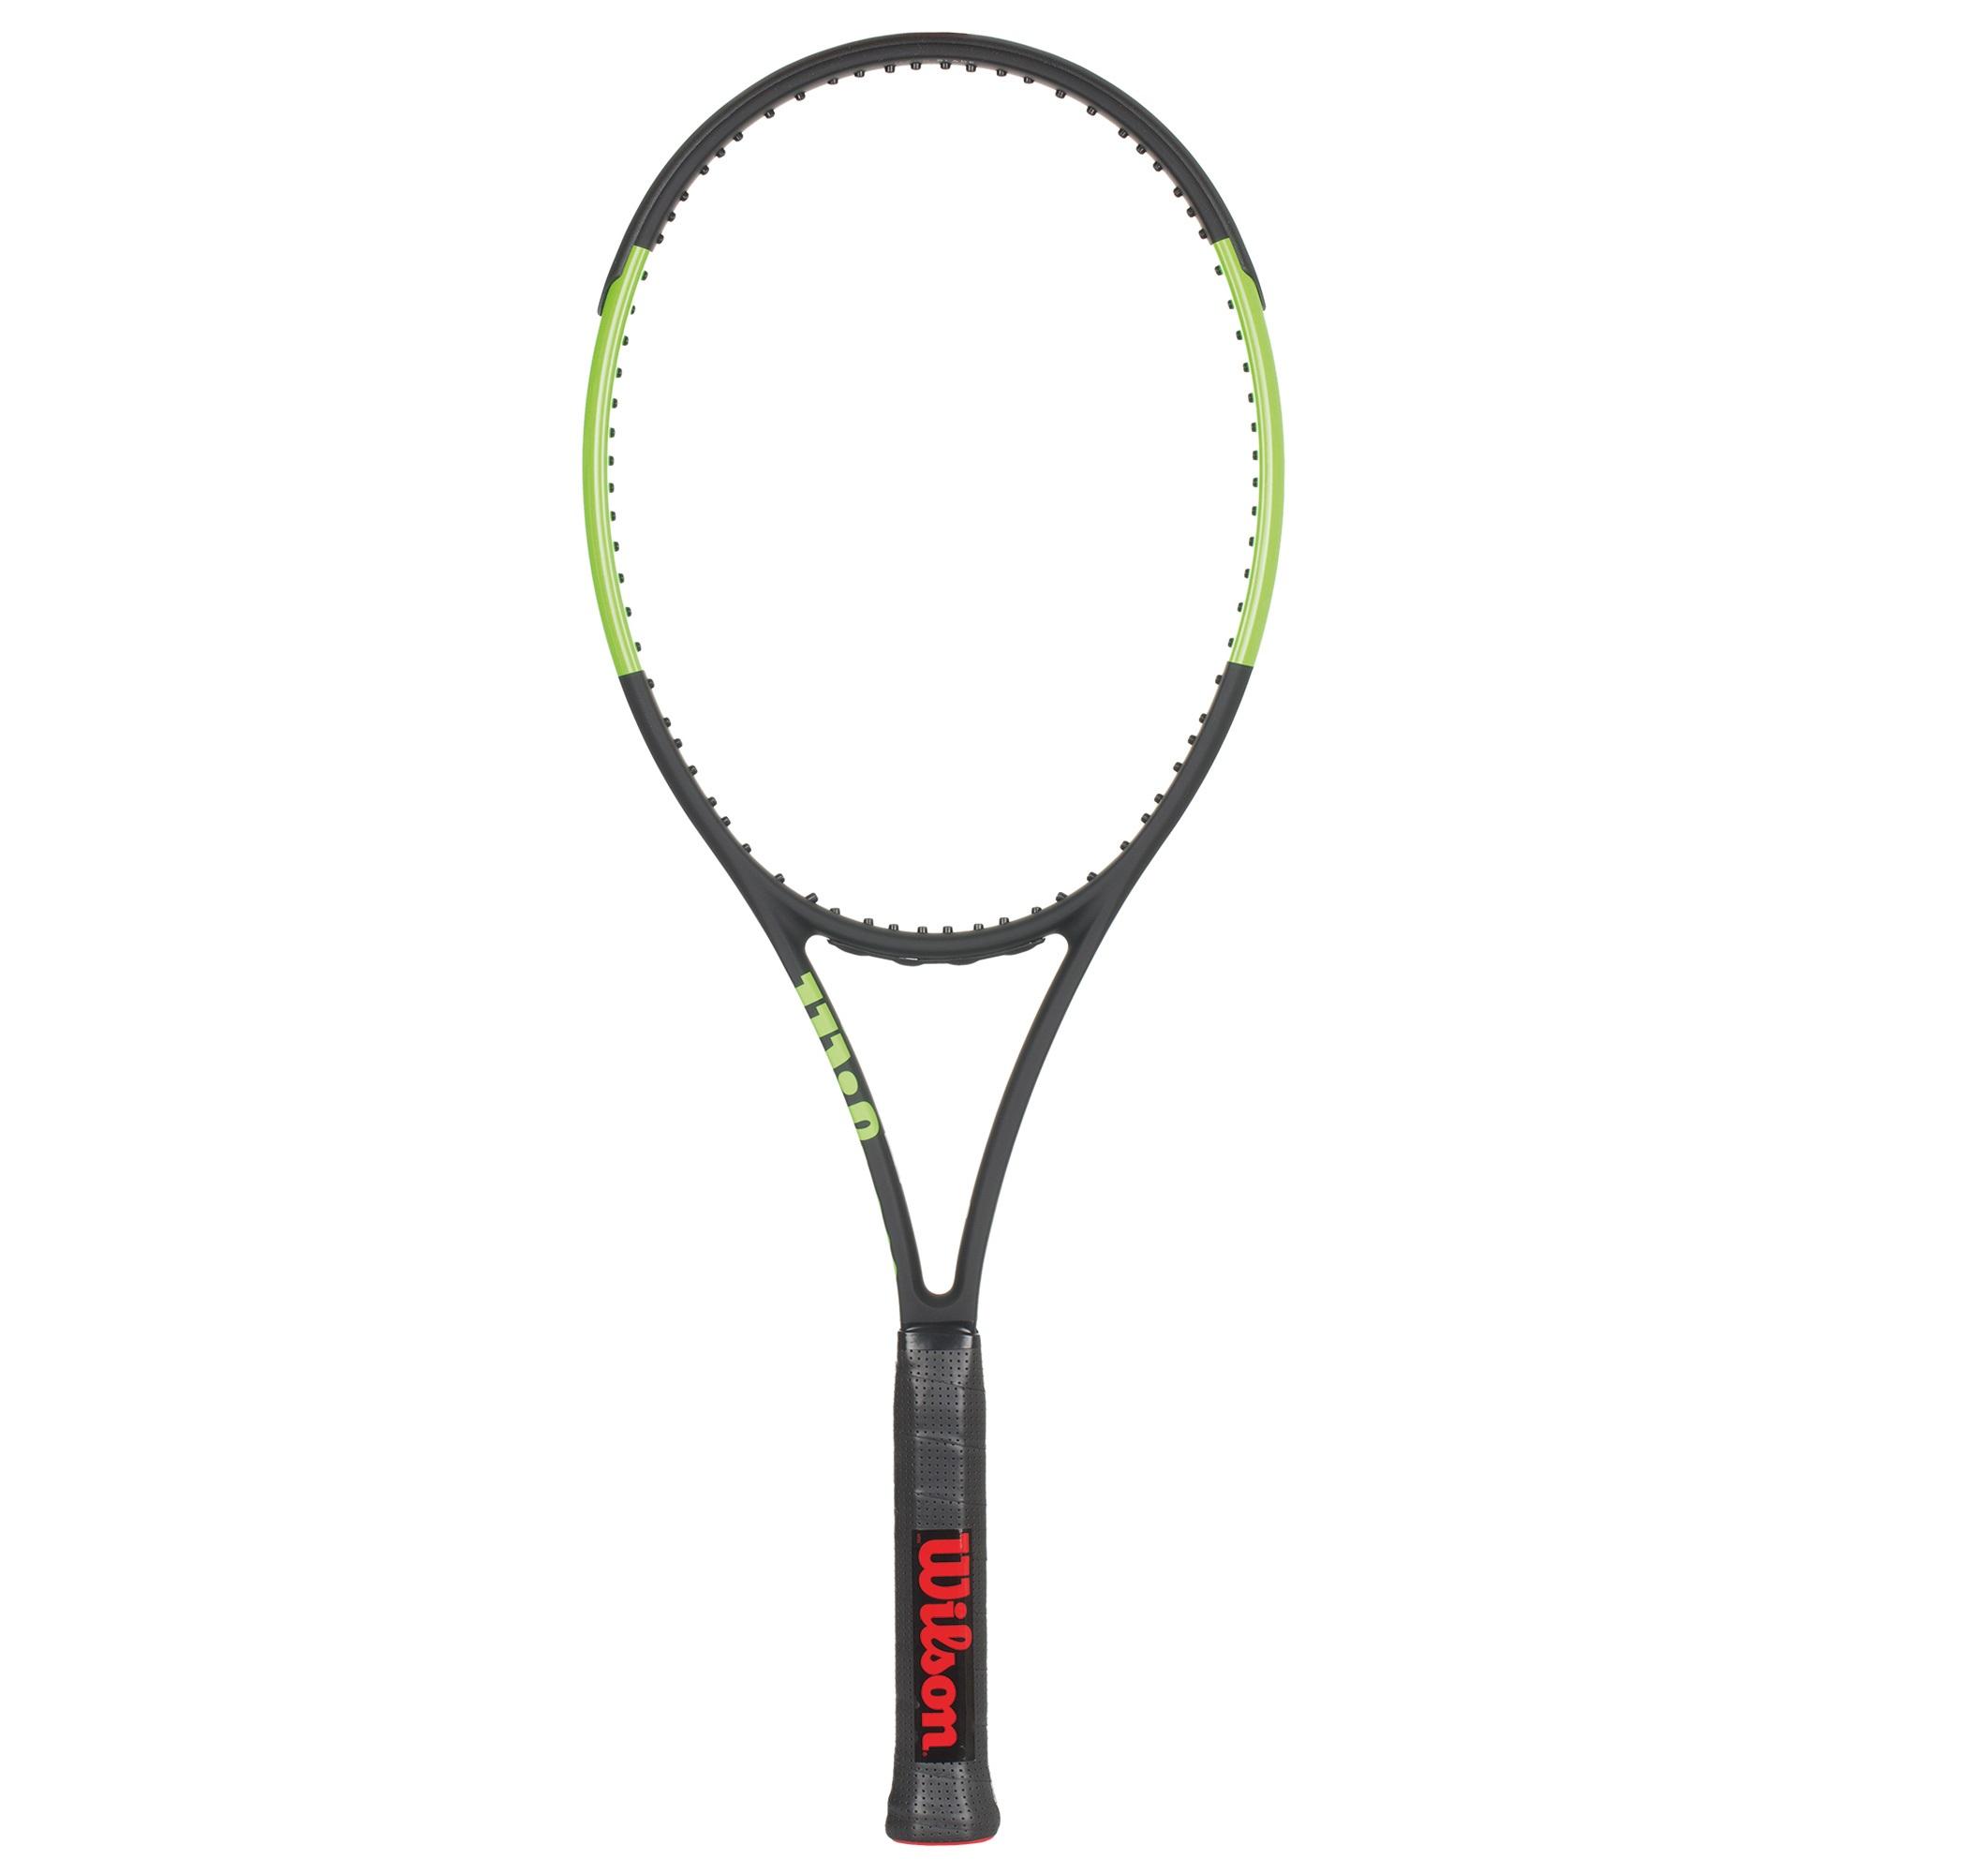 Wilson Ракетка для большого тенниса Wilson Blade 98, размер 3 wilson ракетка для большого тенниса детская wilson roger federer 23 размер без размера